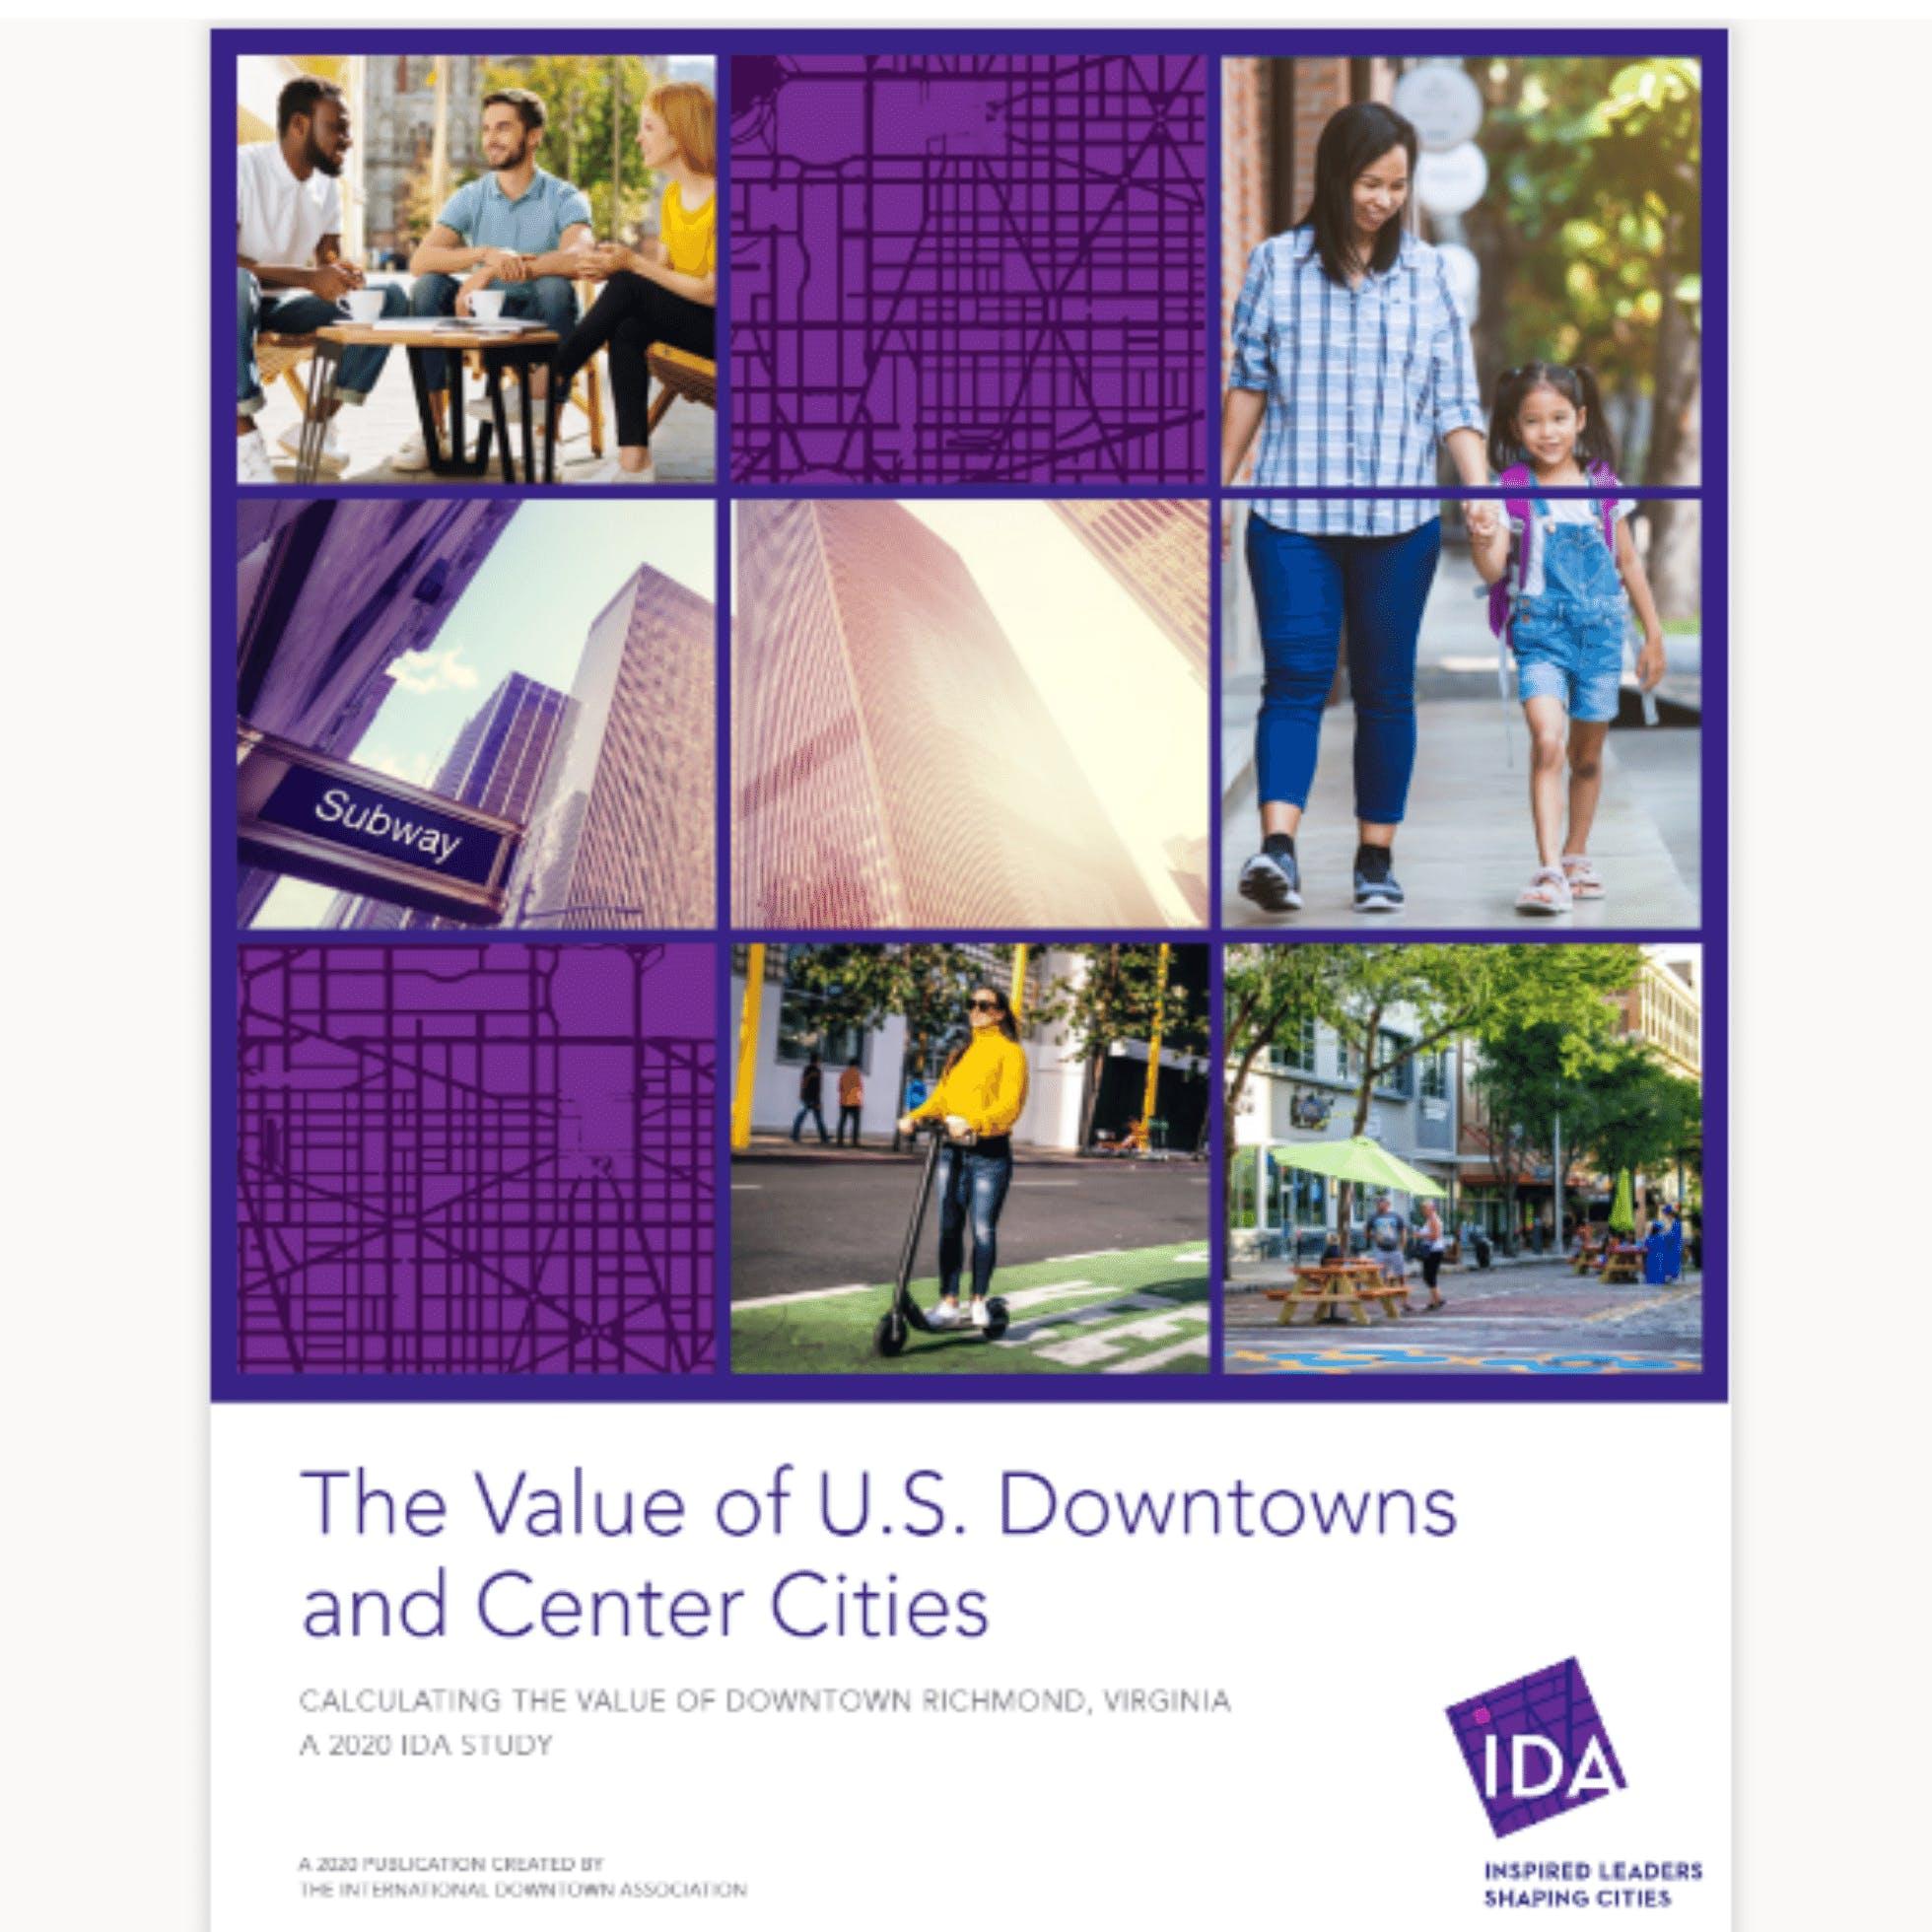 The 2020 IDA Study: Richmond, Virginia